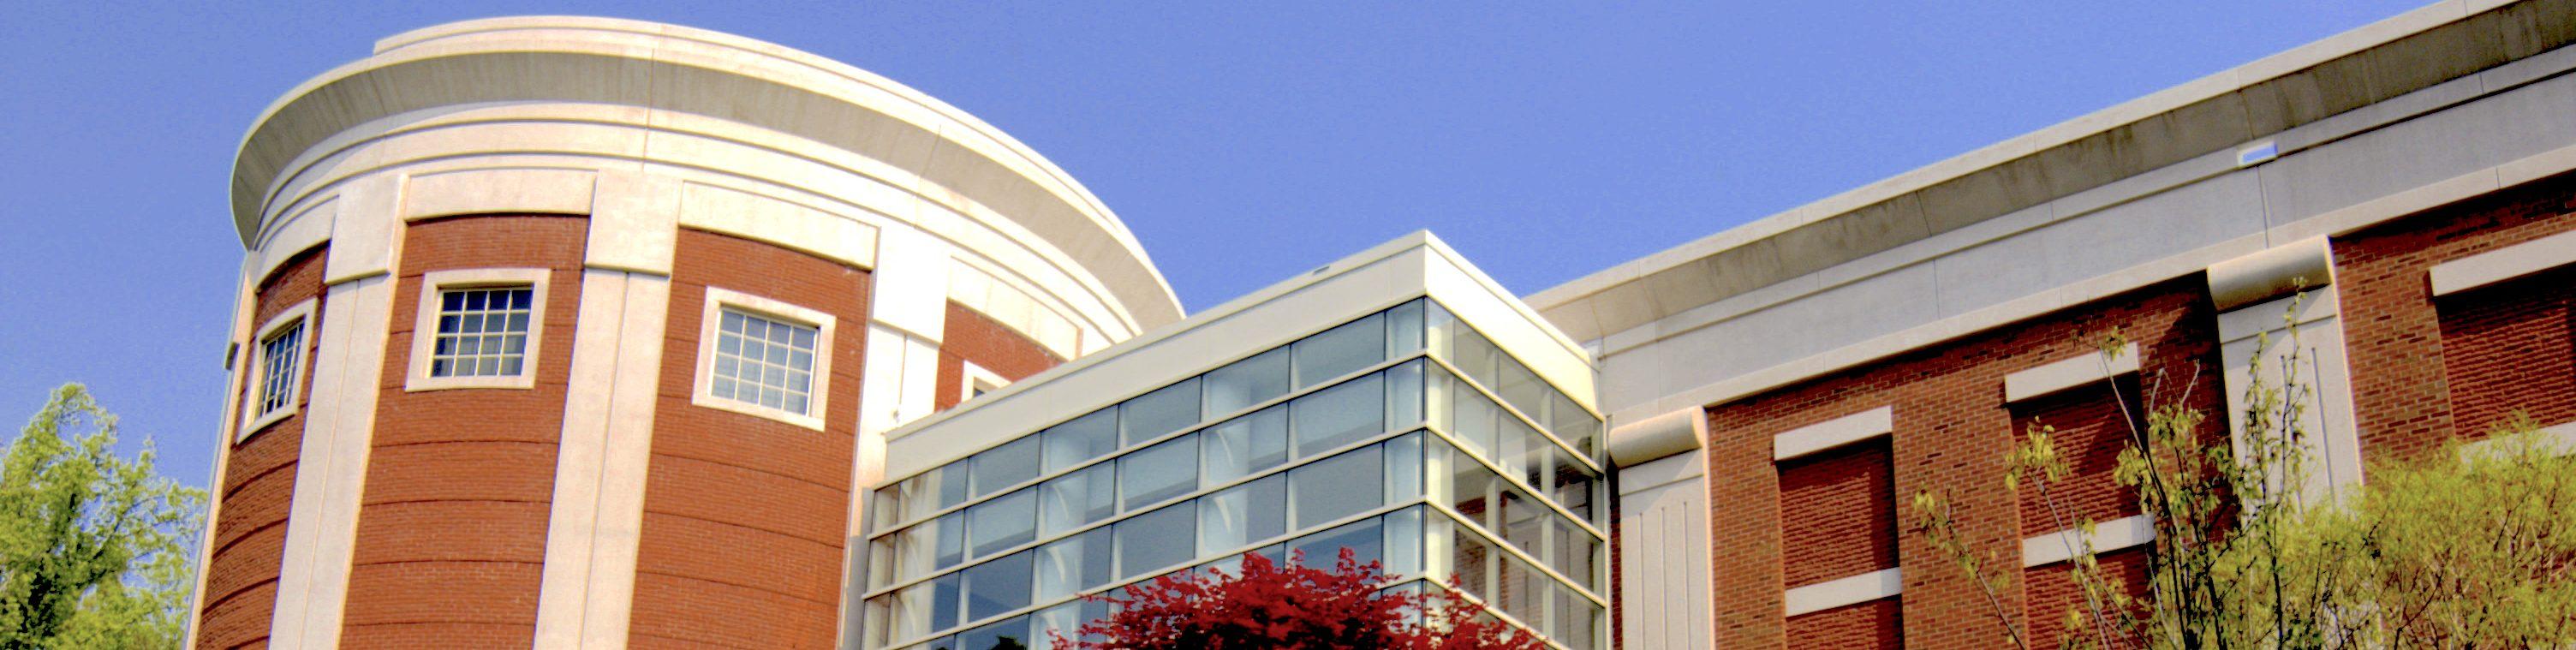 CVPA Building